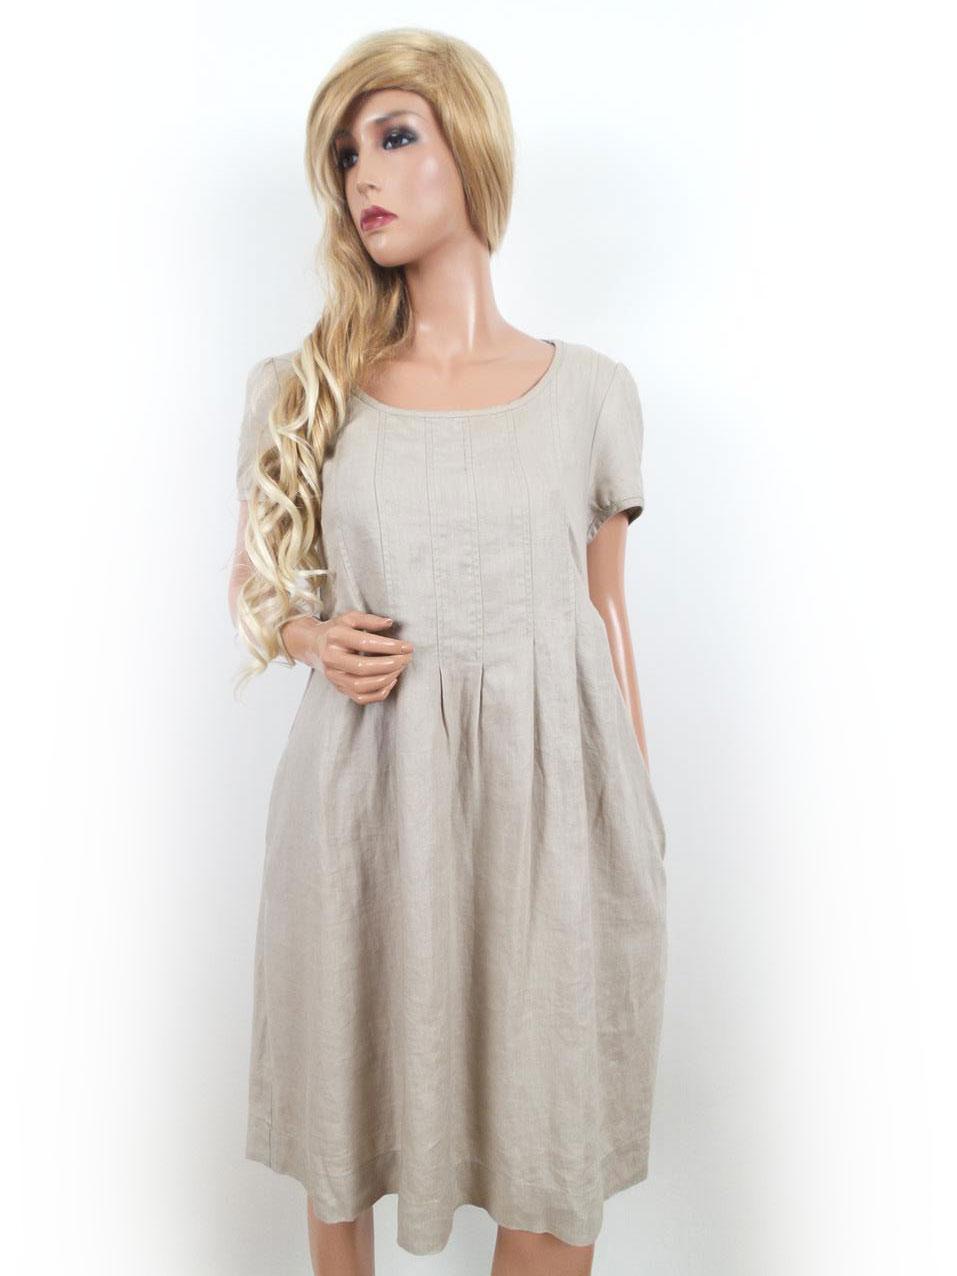 0b5dea2b300d Jackpot storlek 36 klänning fickor 100% linne beige | RomanticFashion.se